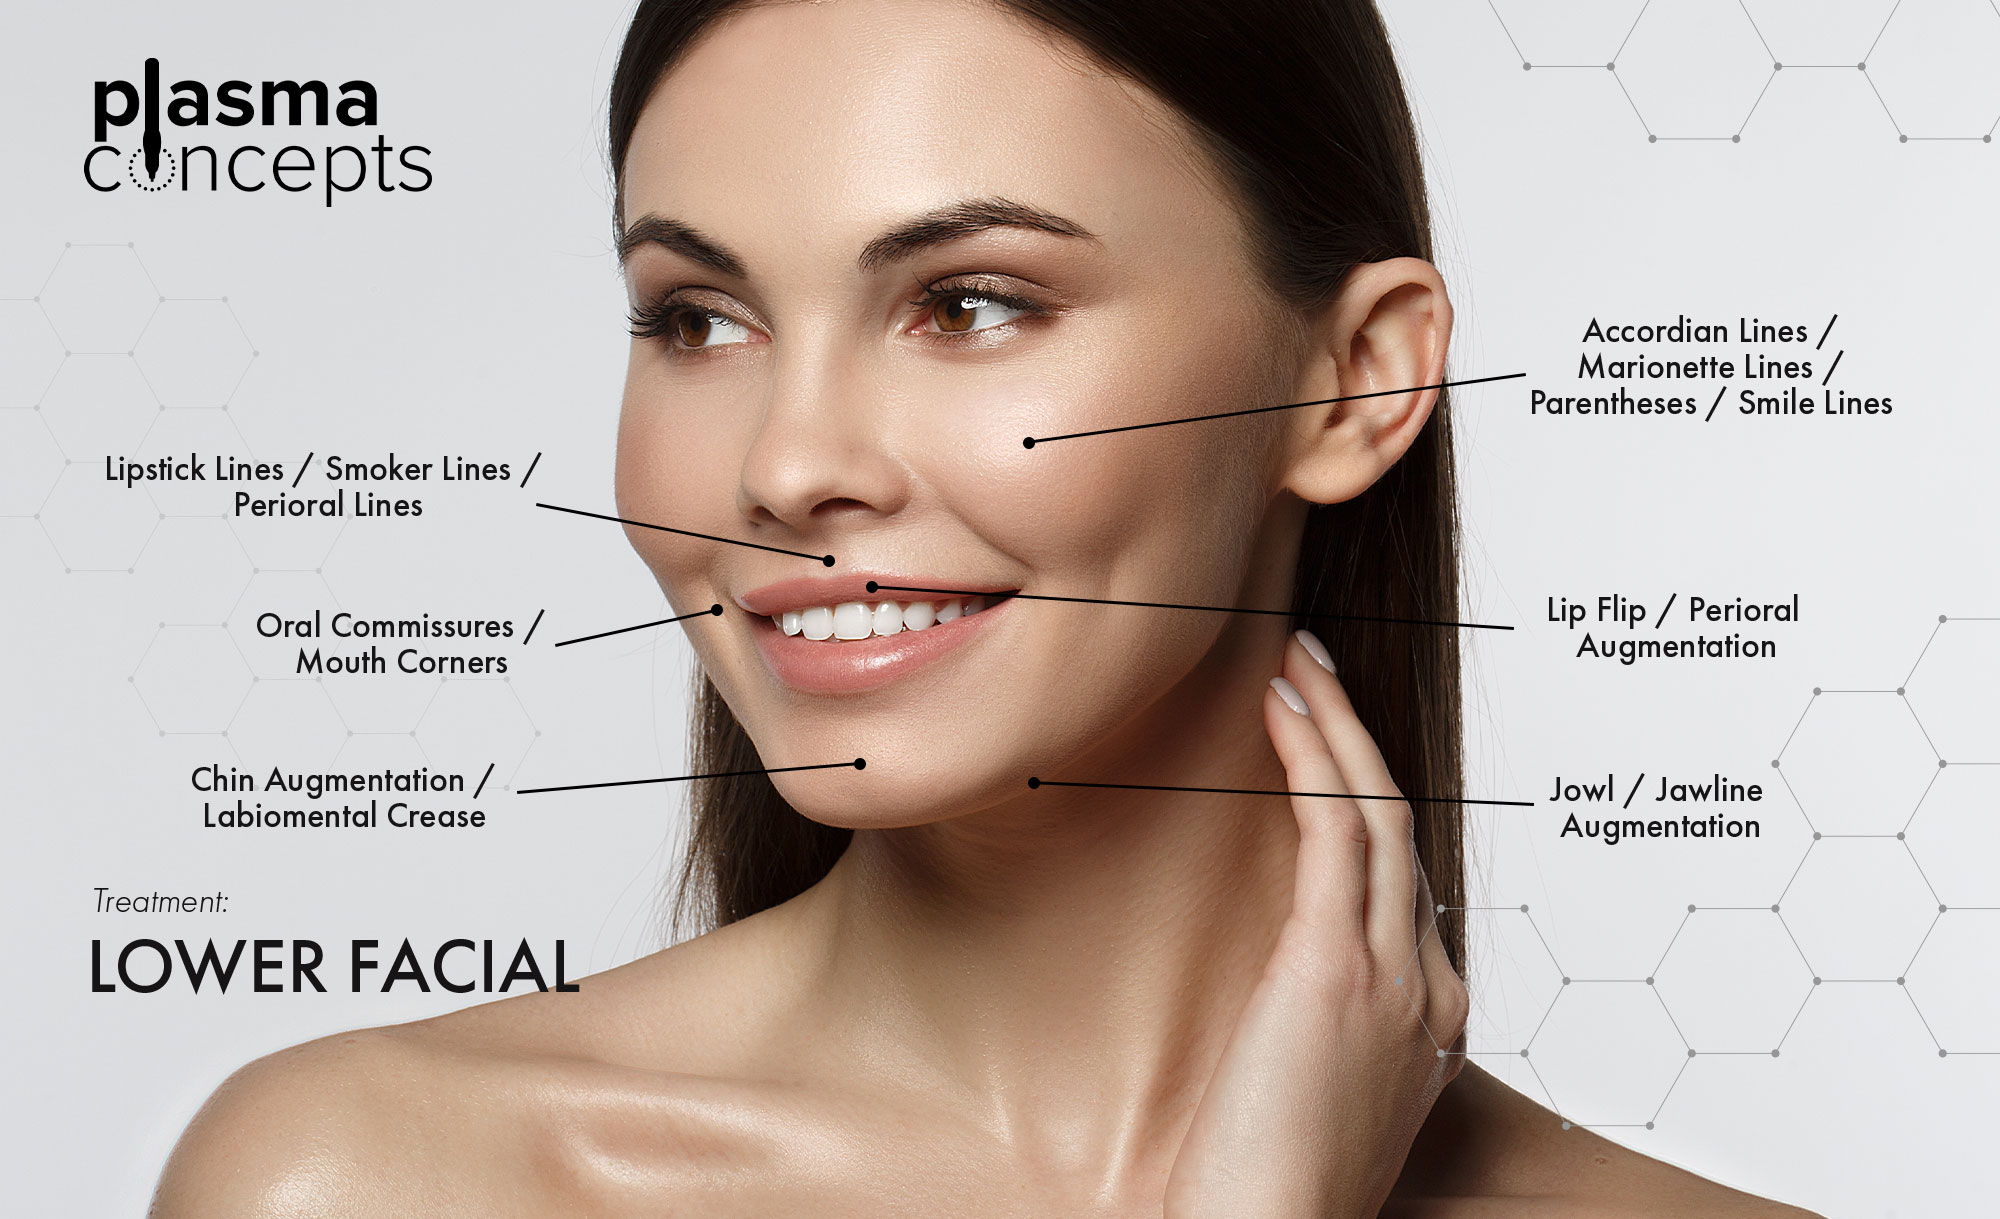 Gainesville Lower Facial Treatment Guide The Plasma Concepts Pen